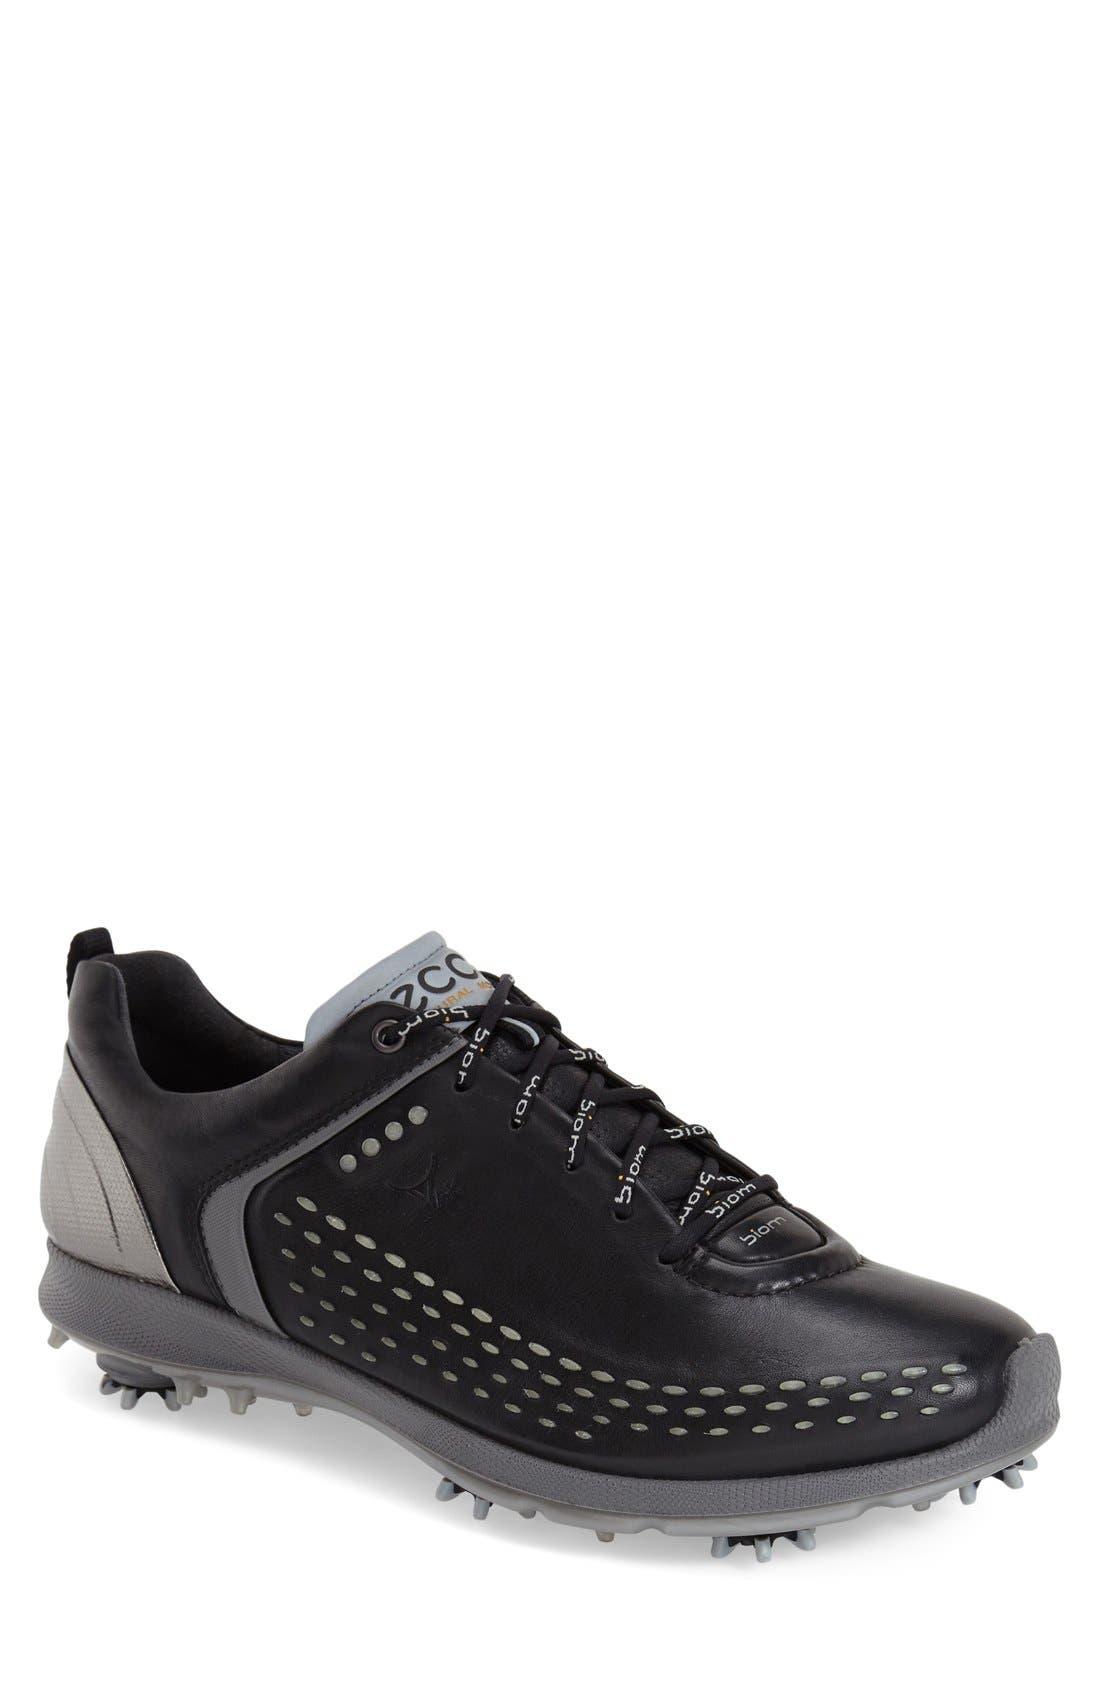 ECCO BIOM Hydromax Waterproof Golf Shoe (Men)